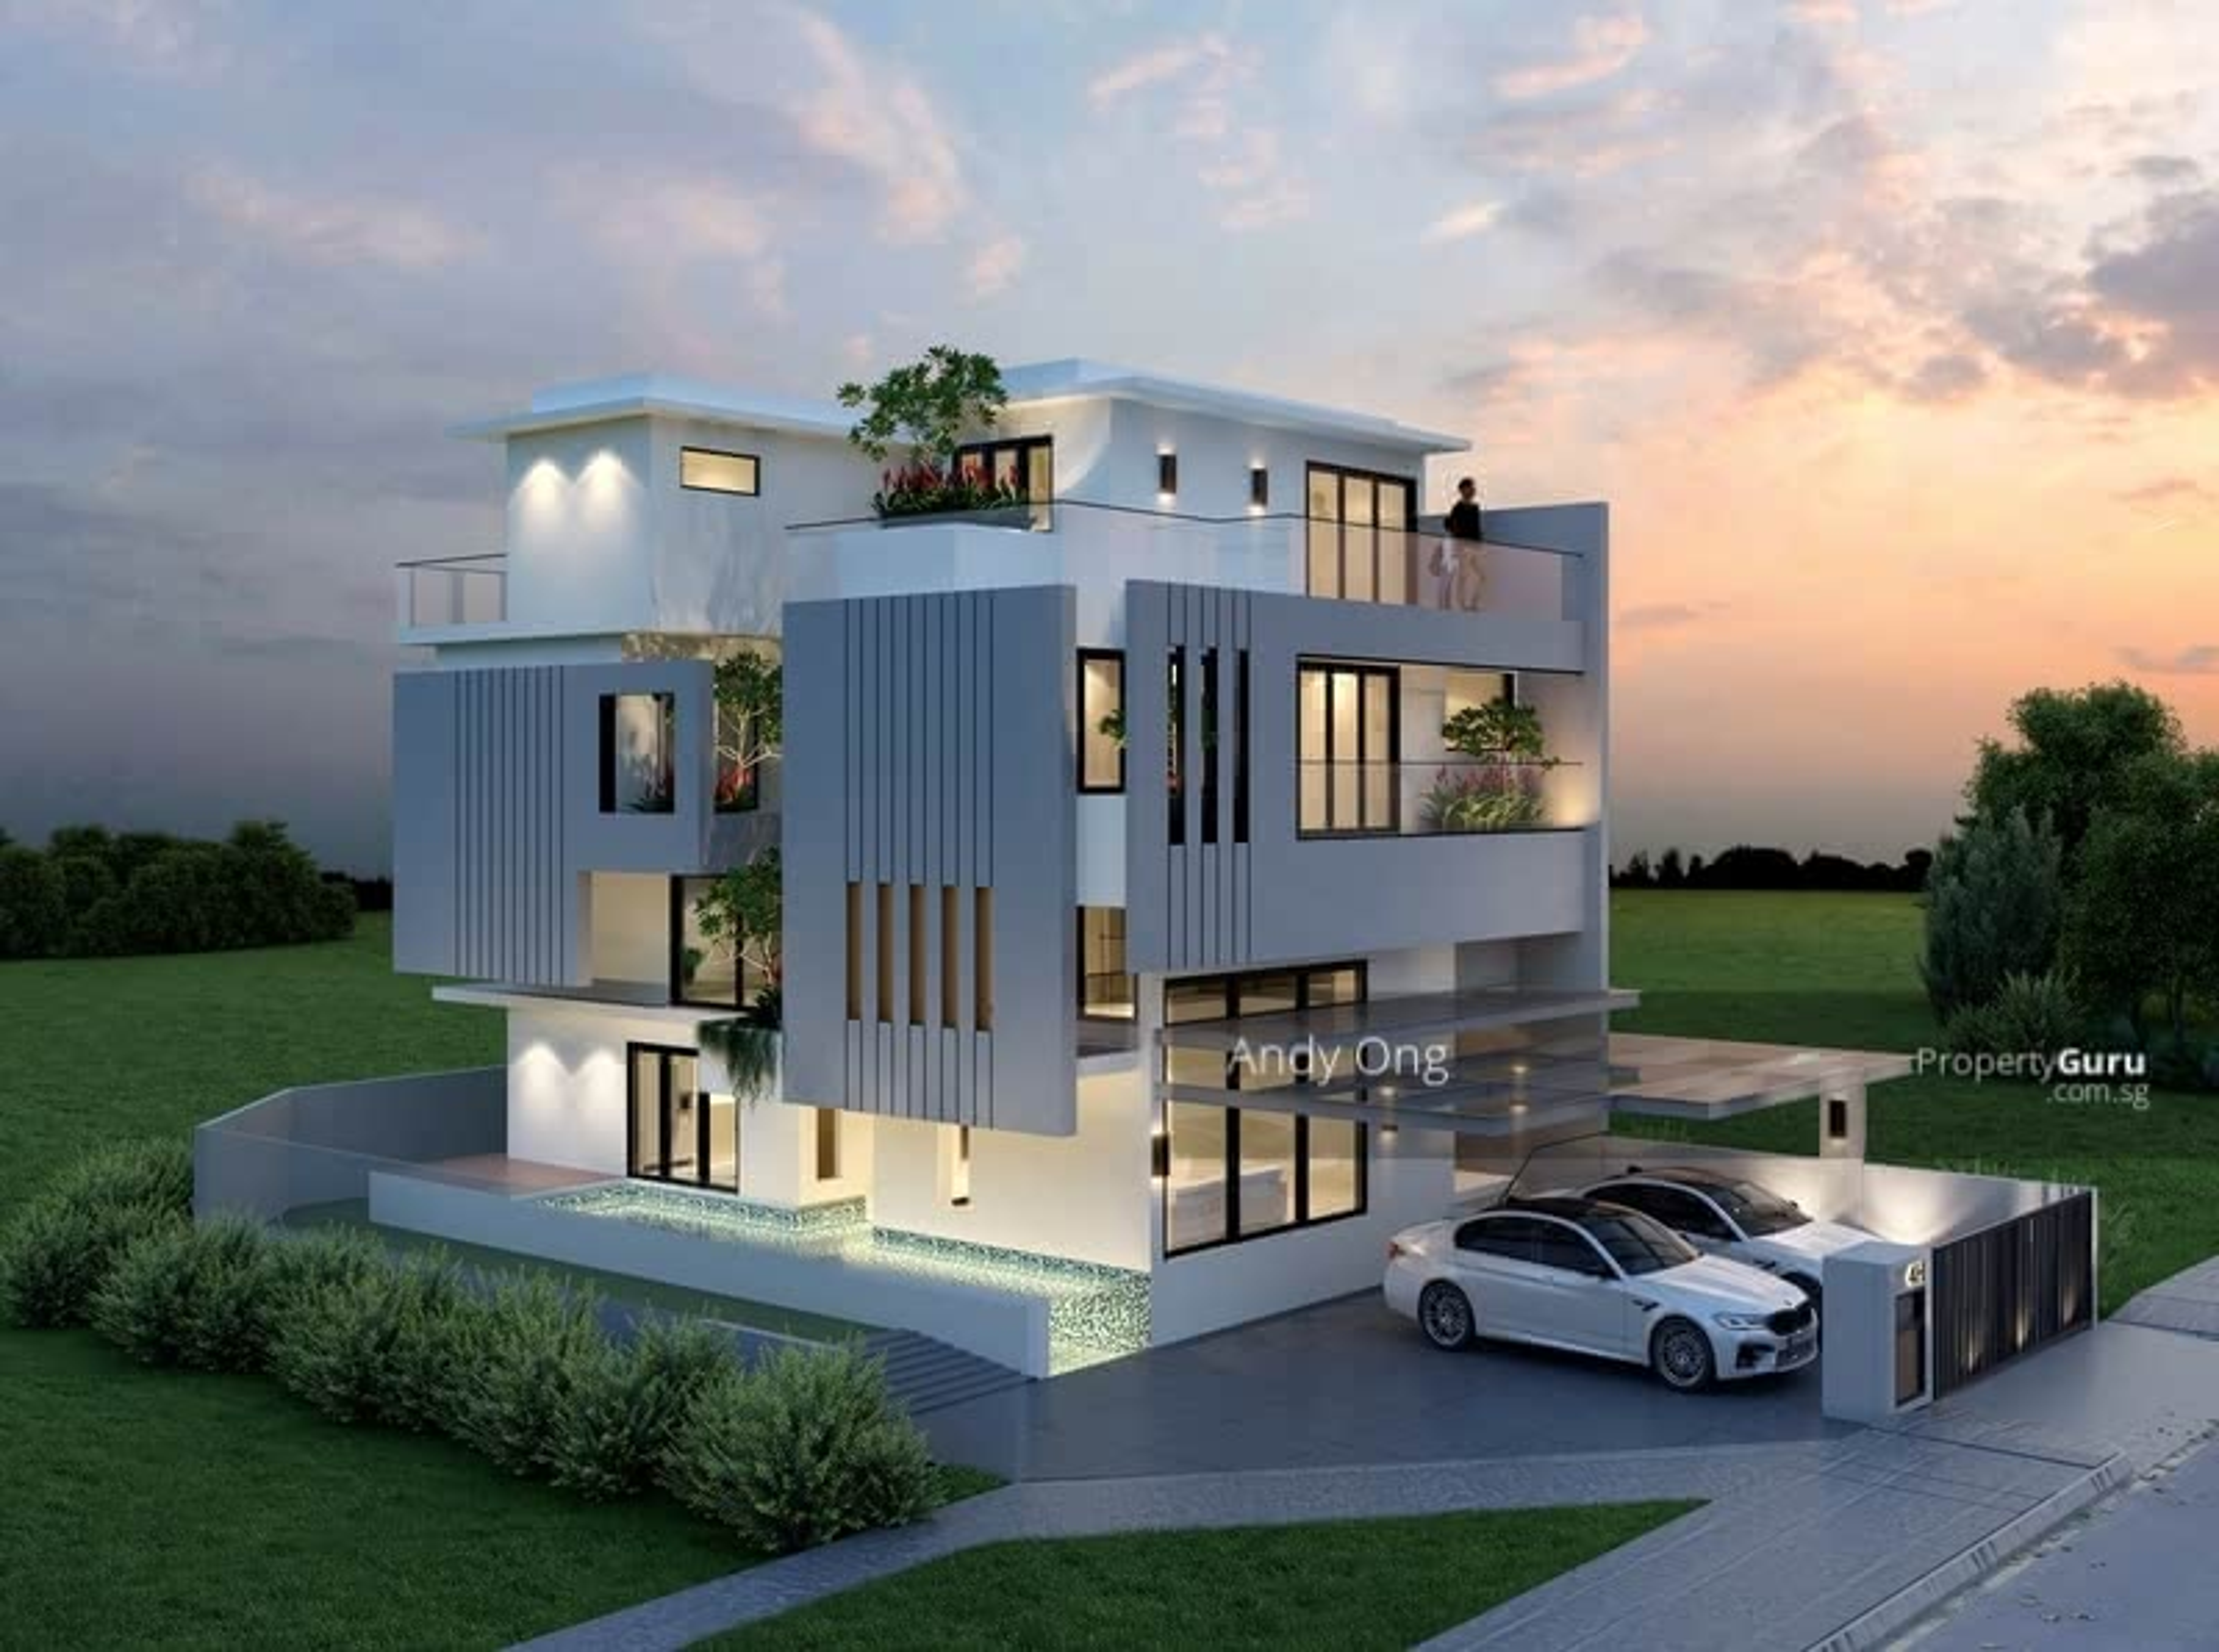 For Sale - ⭐ Stunning Corner Terrace @ D15 ⭐